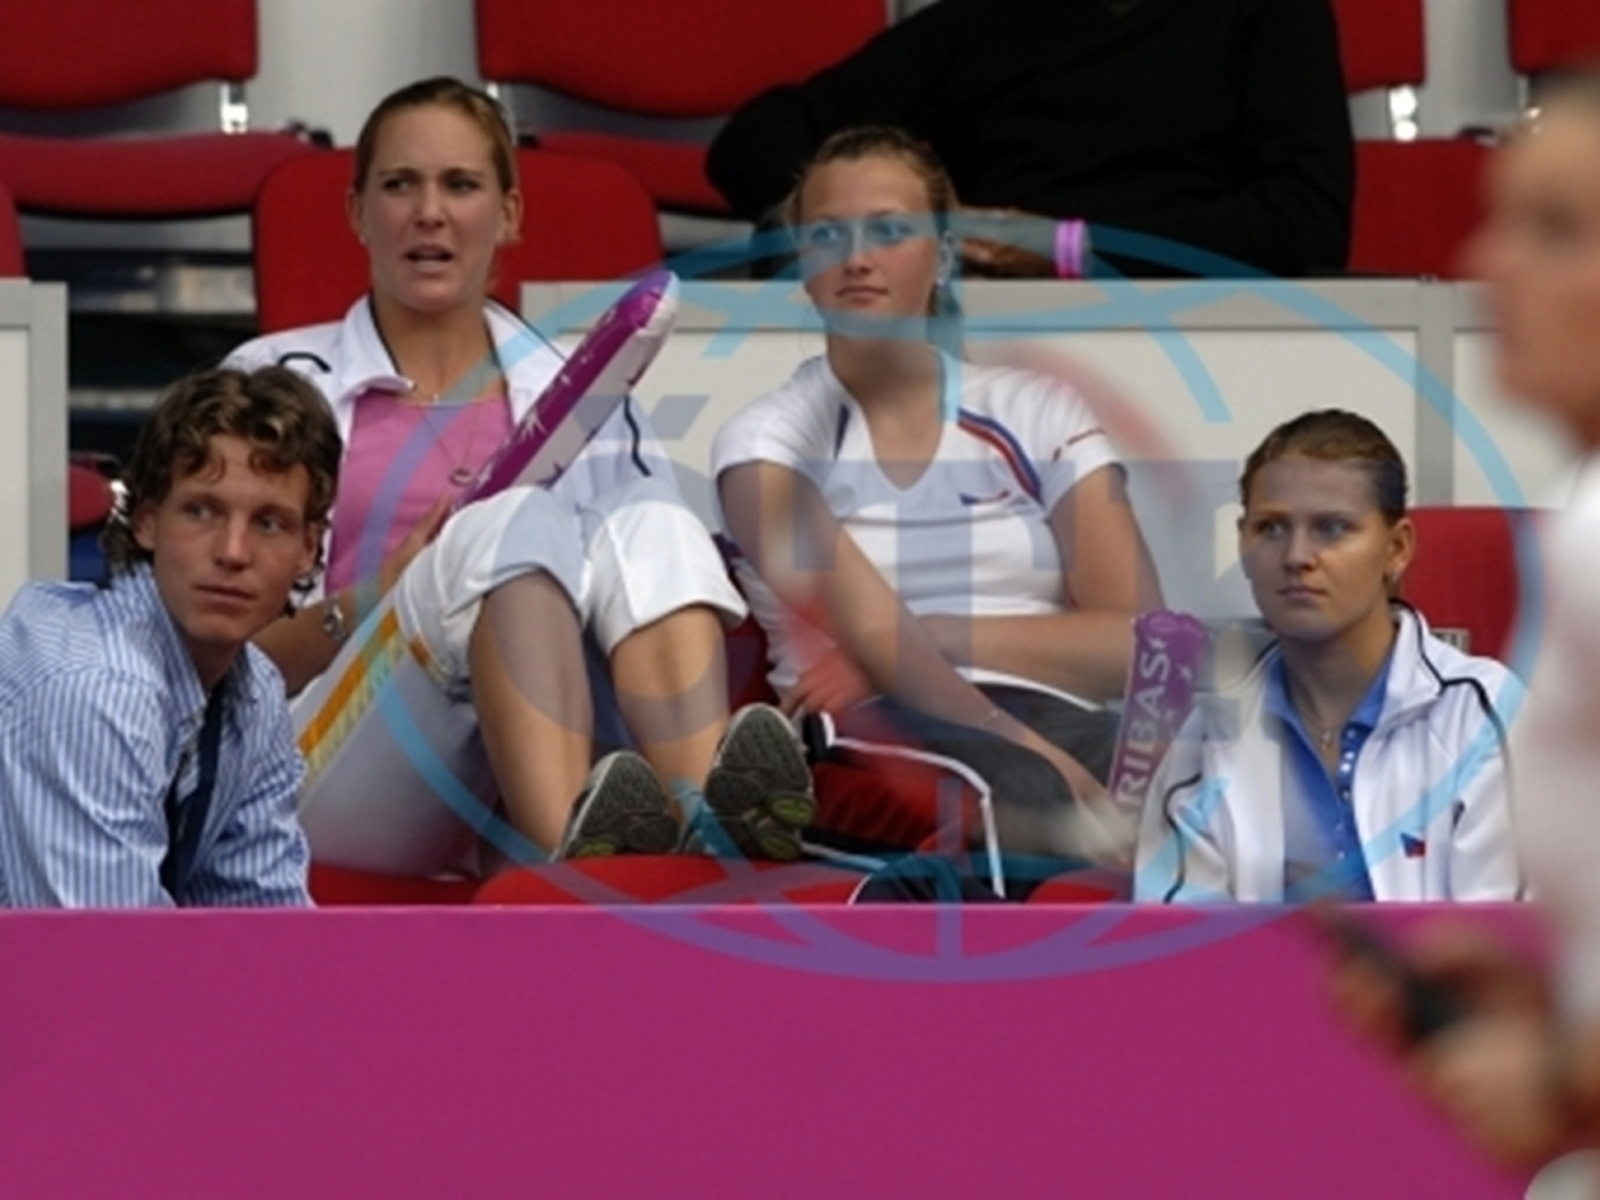 Berdych,Vaidisova ,Kvitova and Safarova in 2007